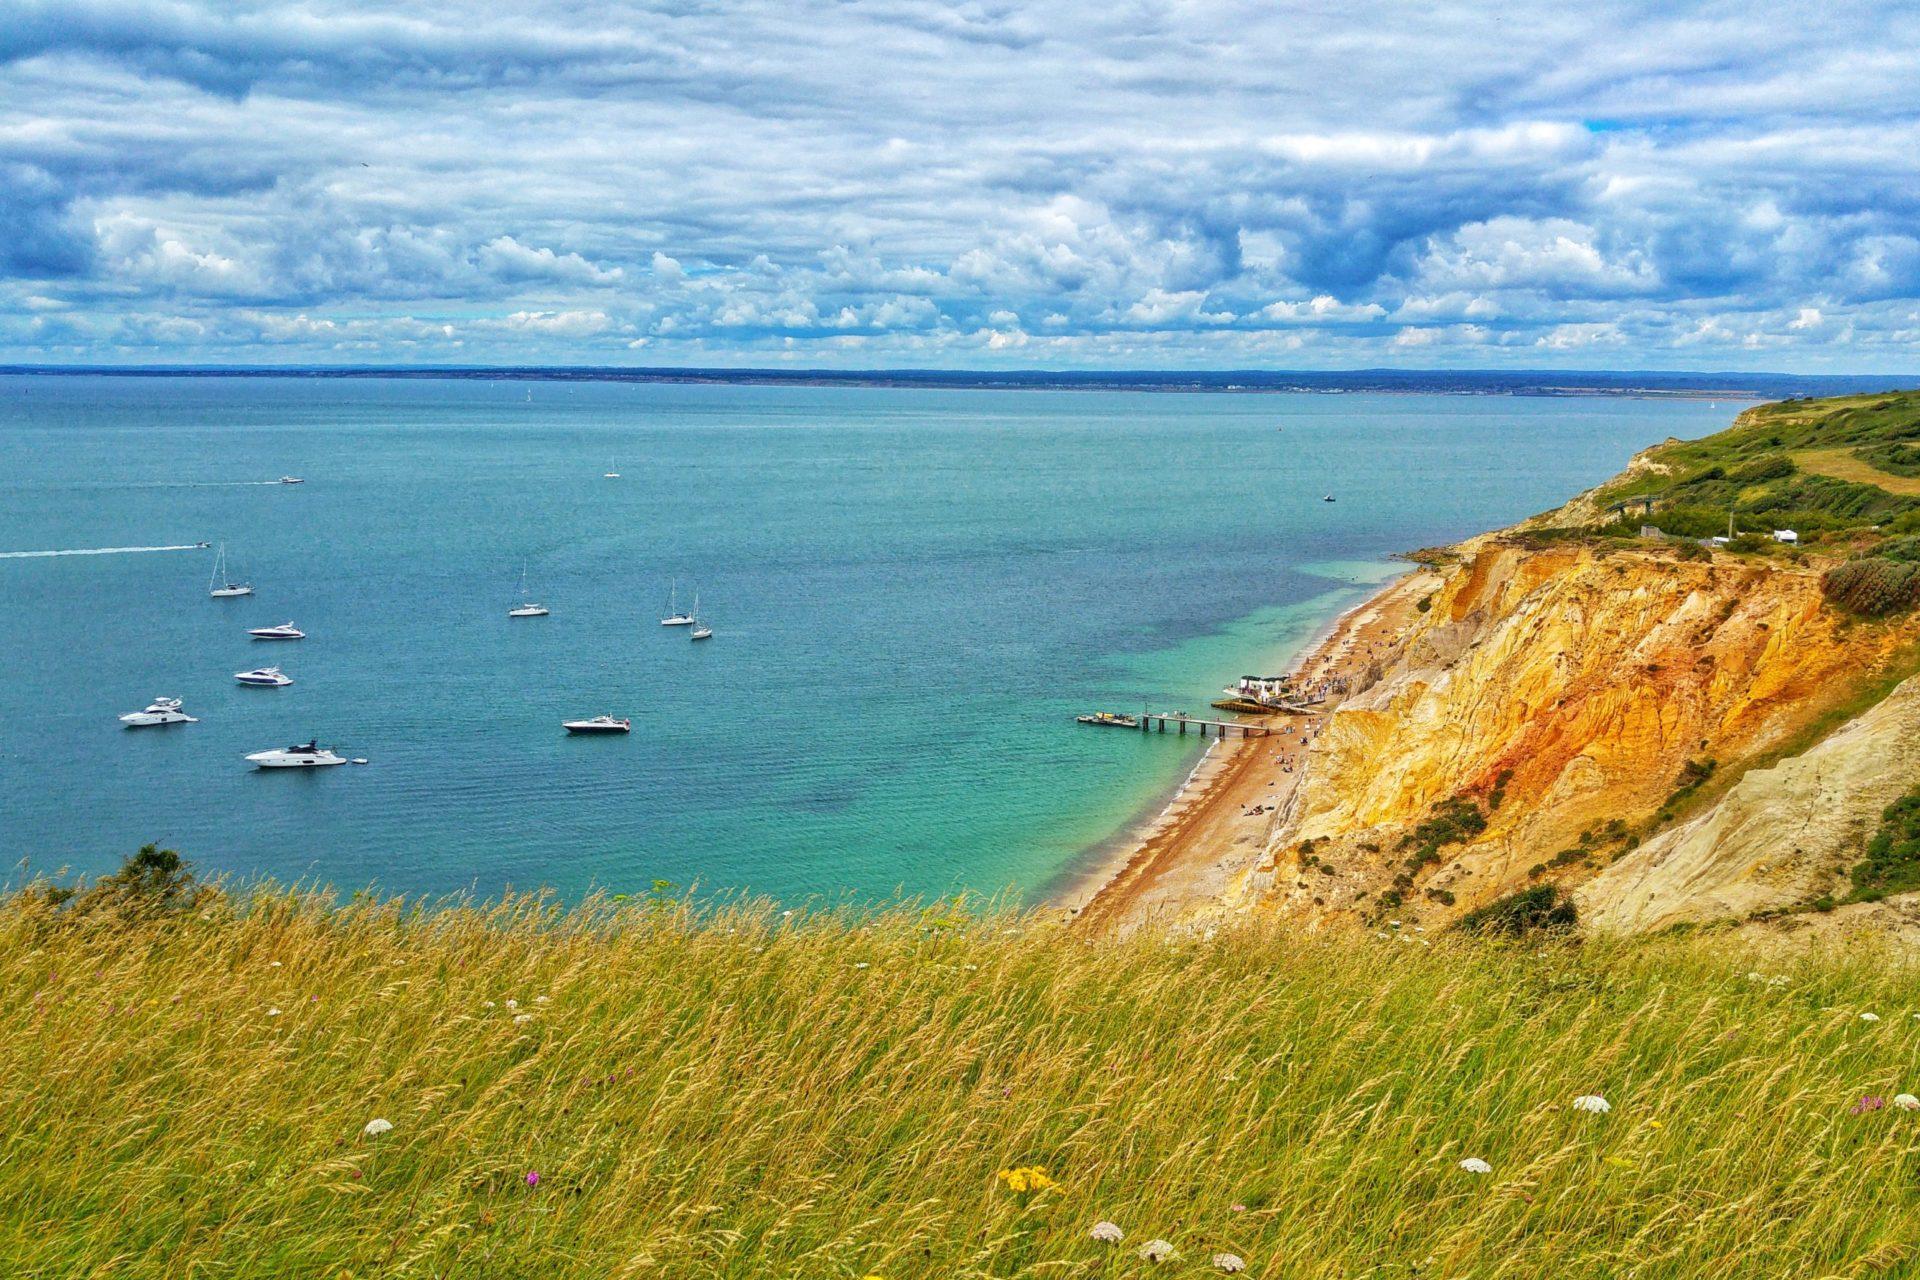 Wassertemperatur Isle of Wight